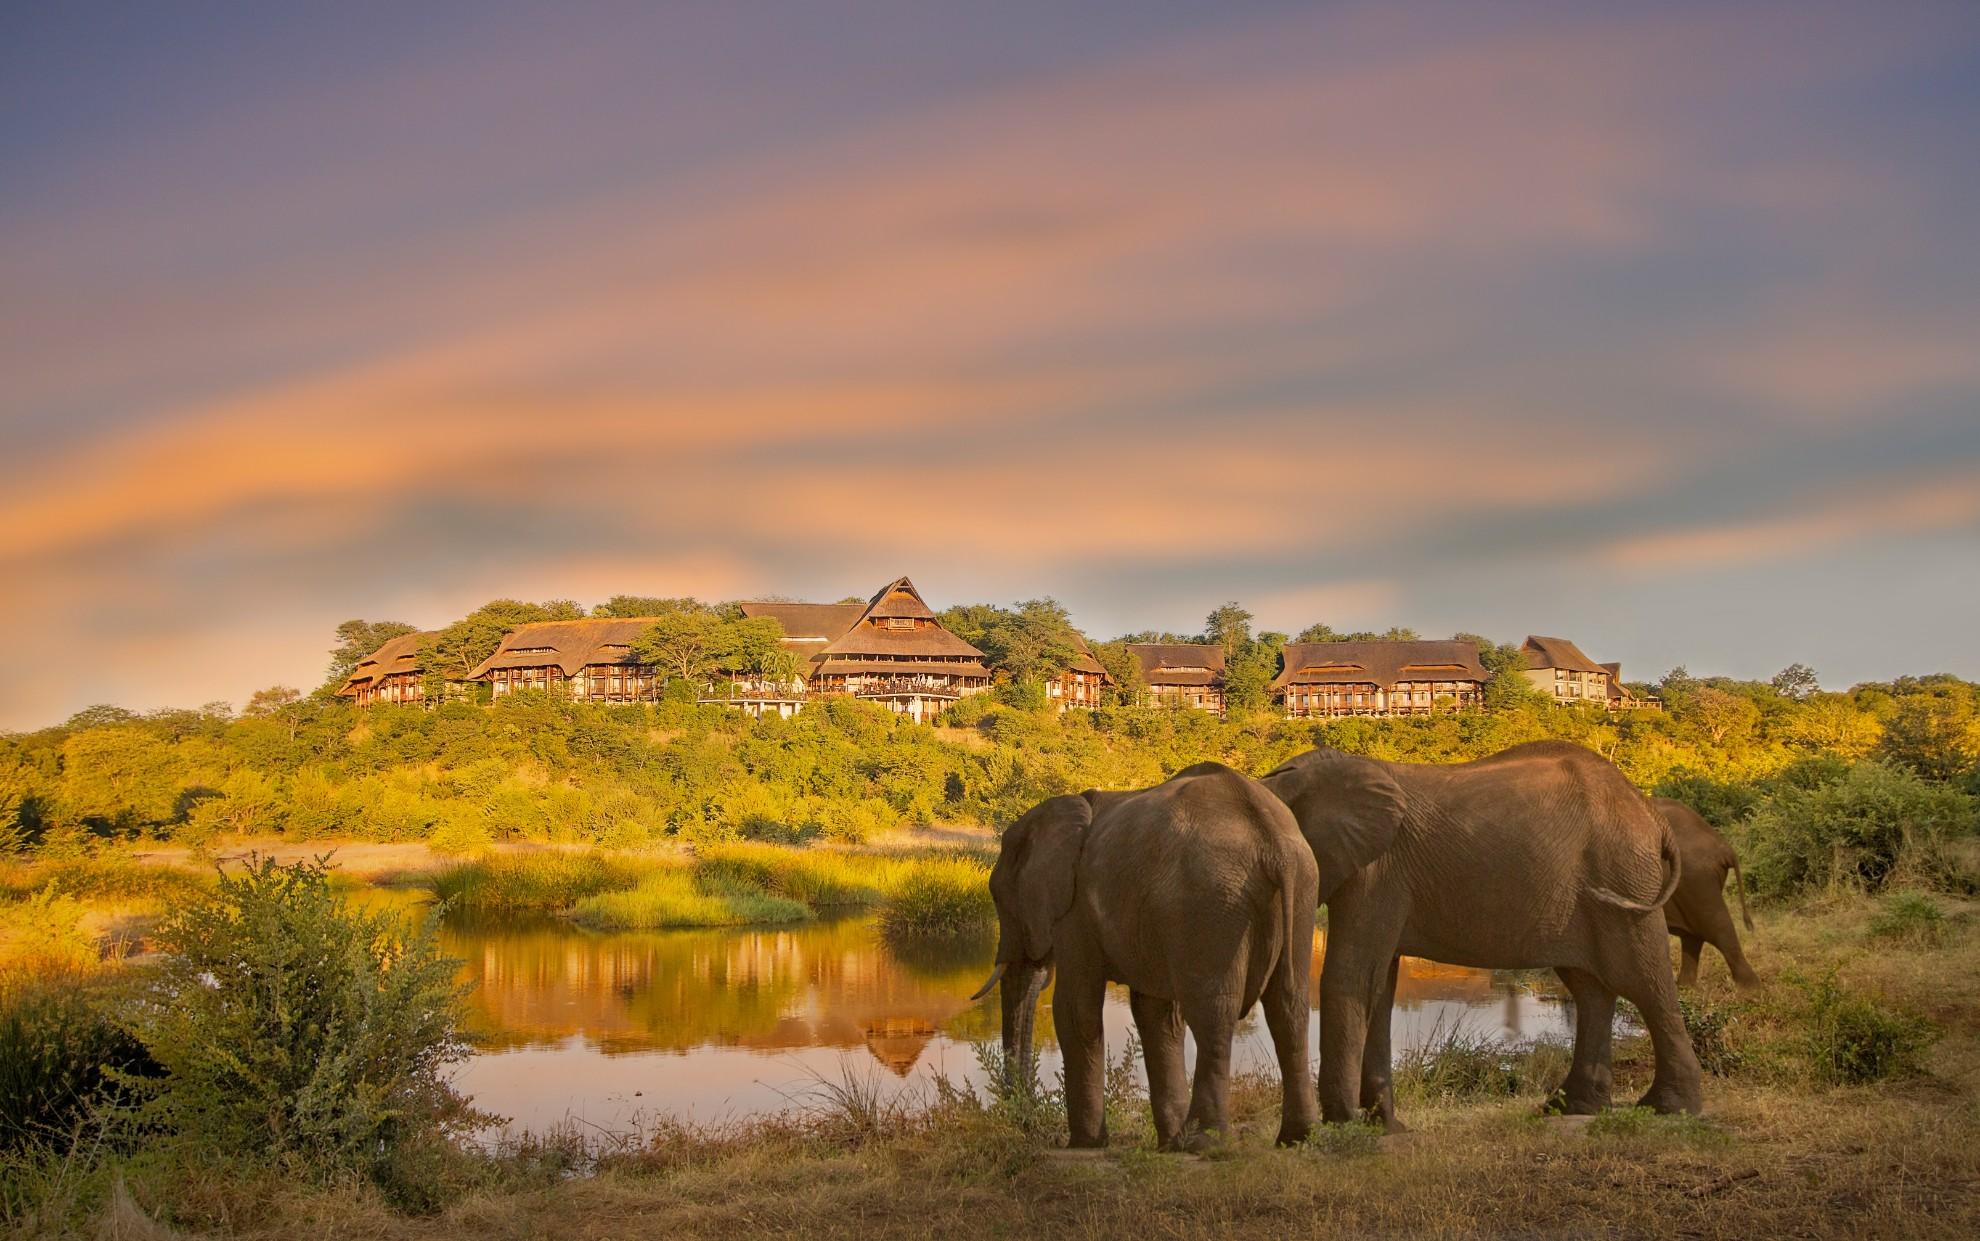 Elephants_in_front_of_victoria_falls_safari_lodge